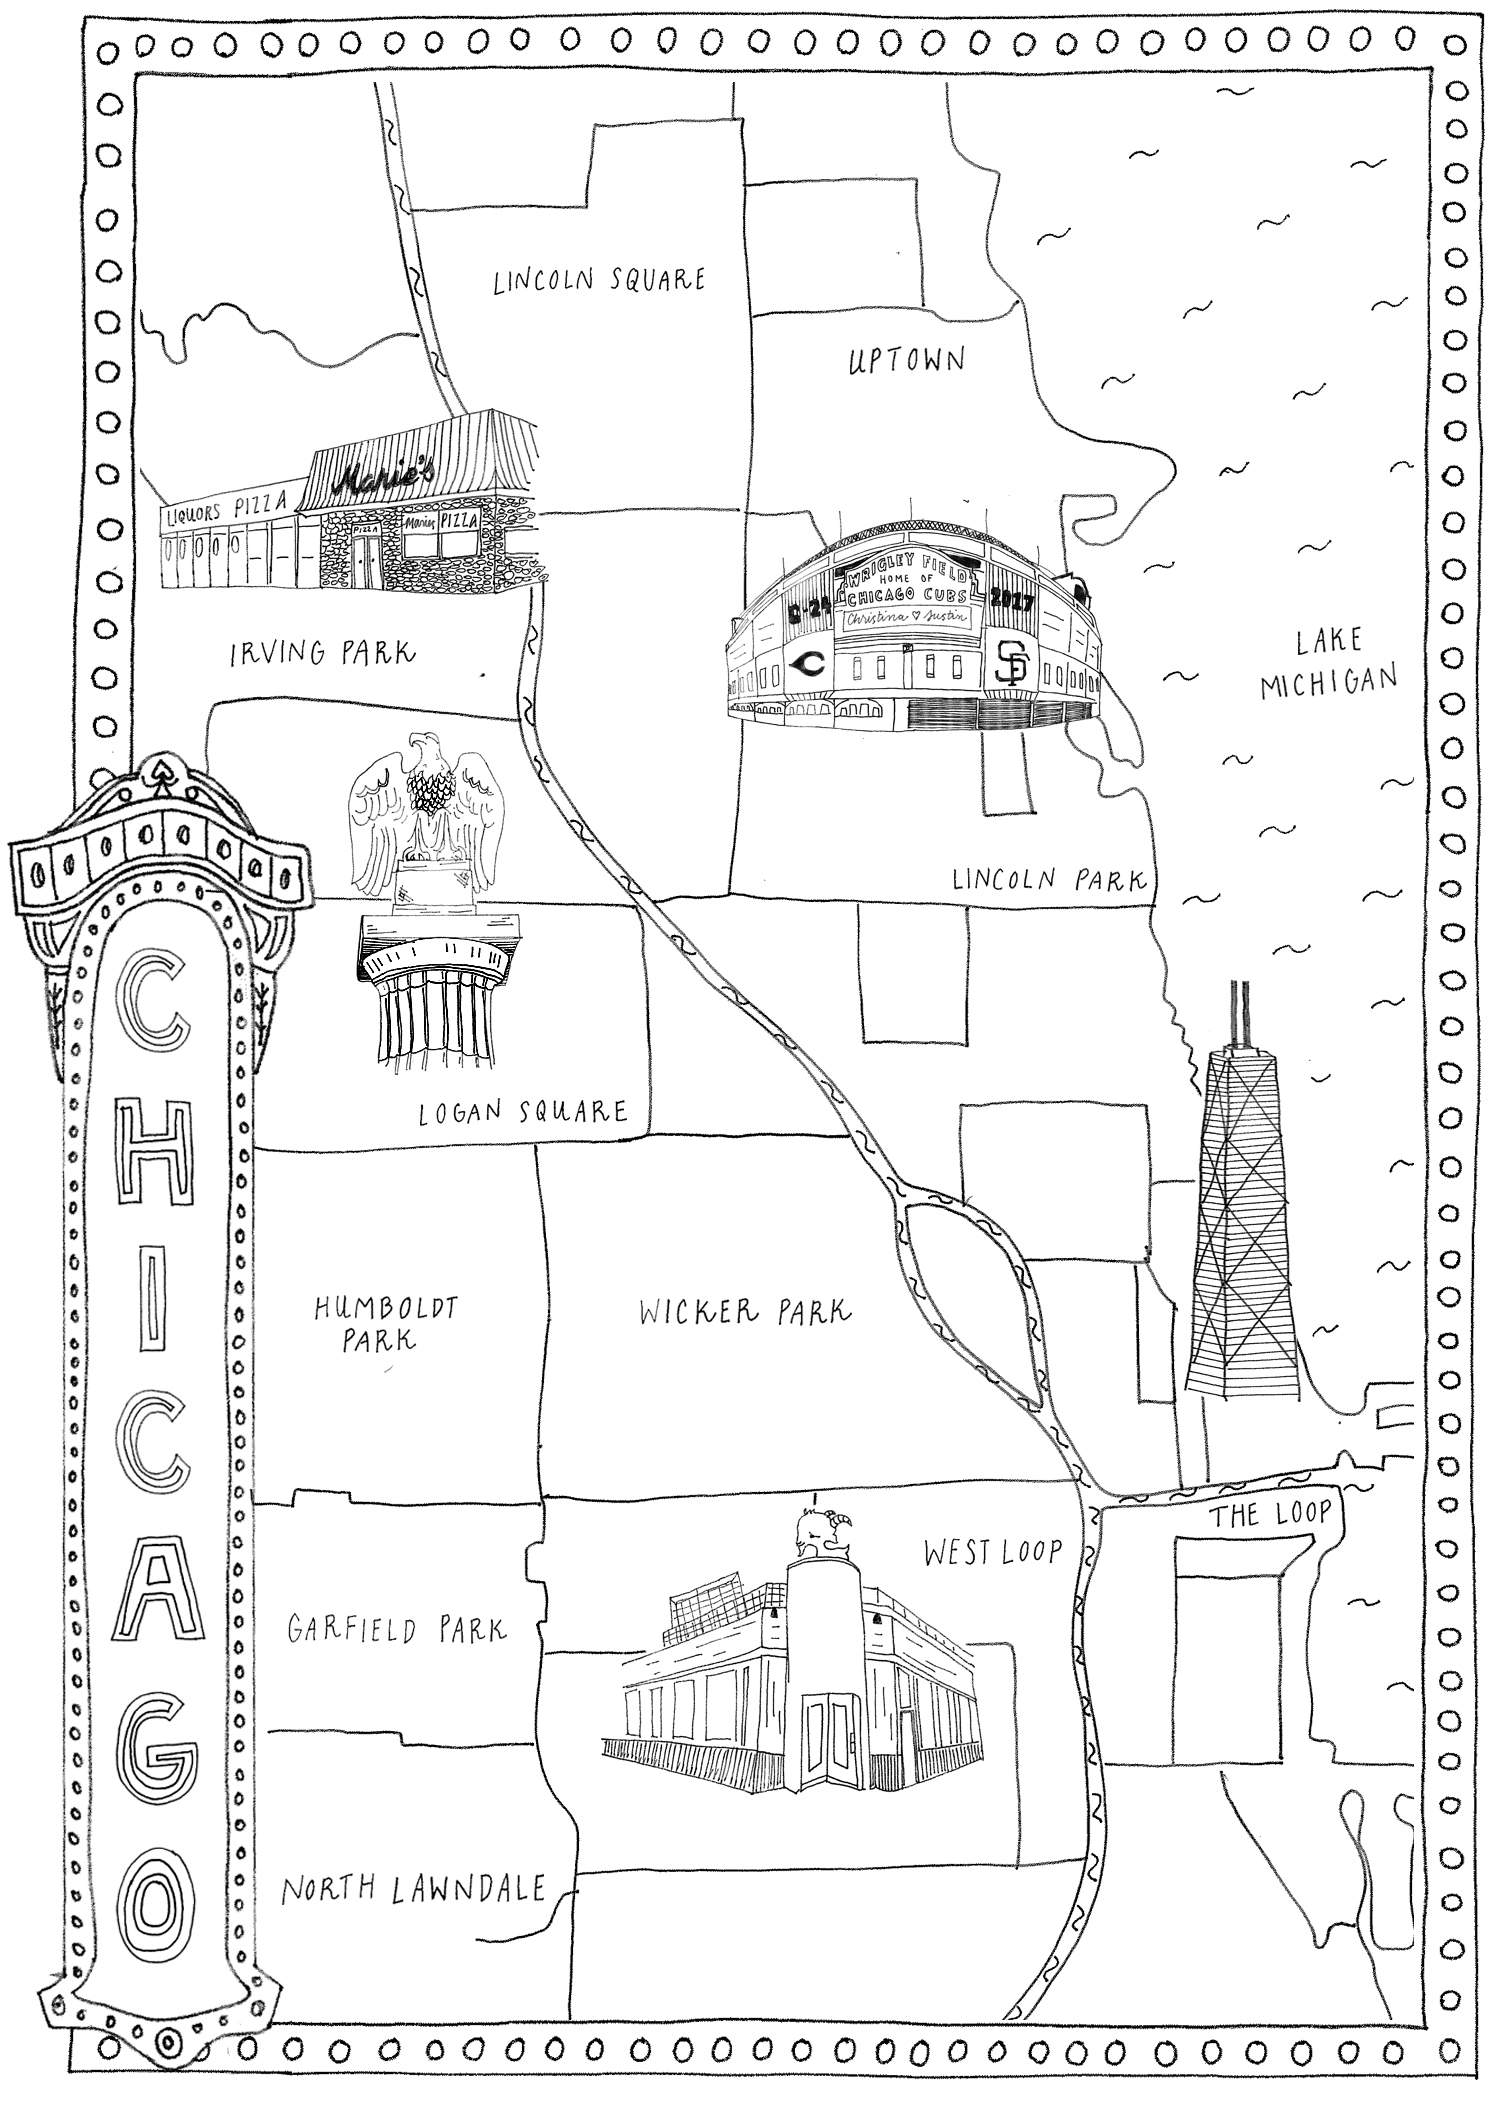 Wedding Map, Chicago